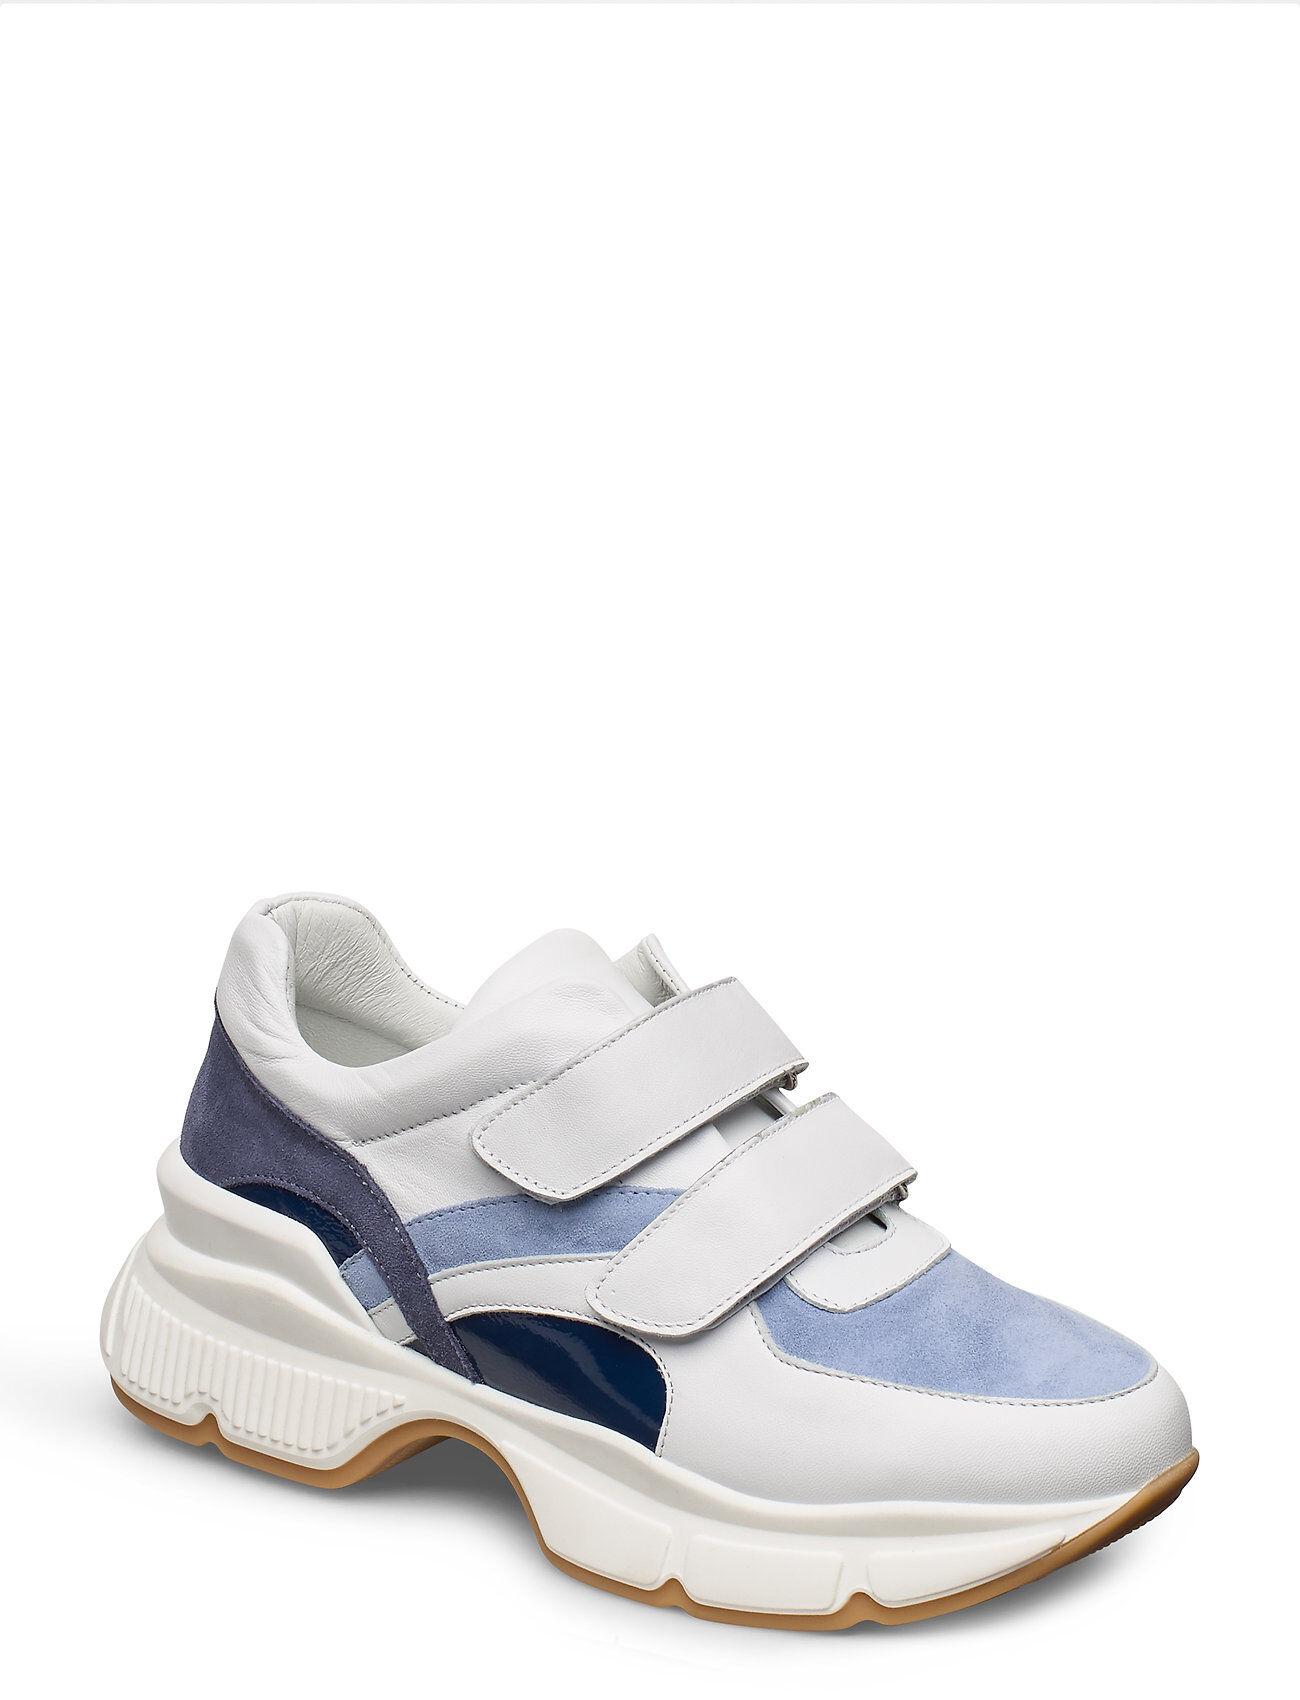 Apair Hole Sole Velcro Color Mix Matalavartiset Sneakerit Tennarit Valkoinen Apair